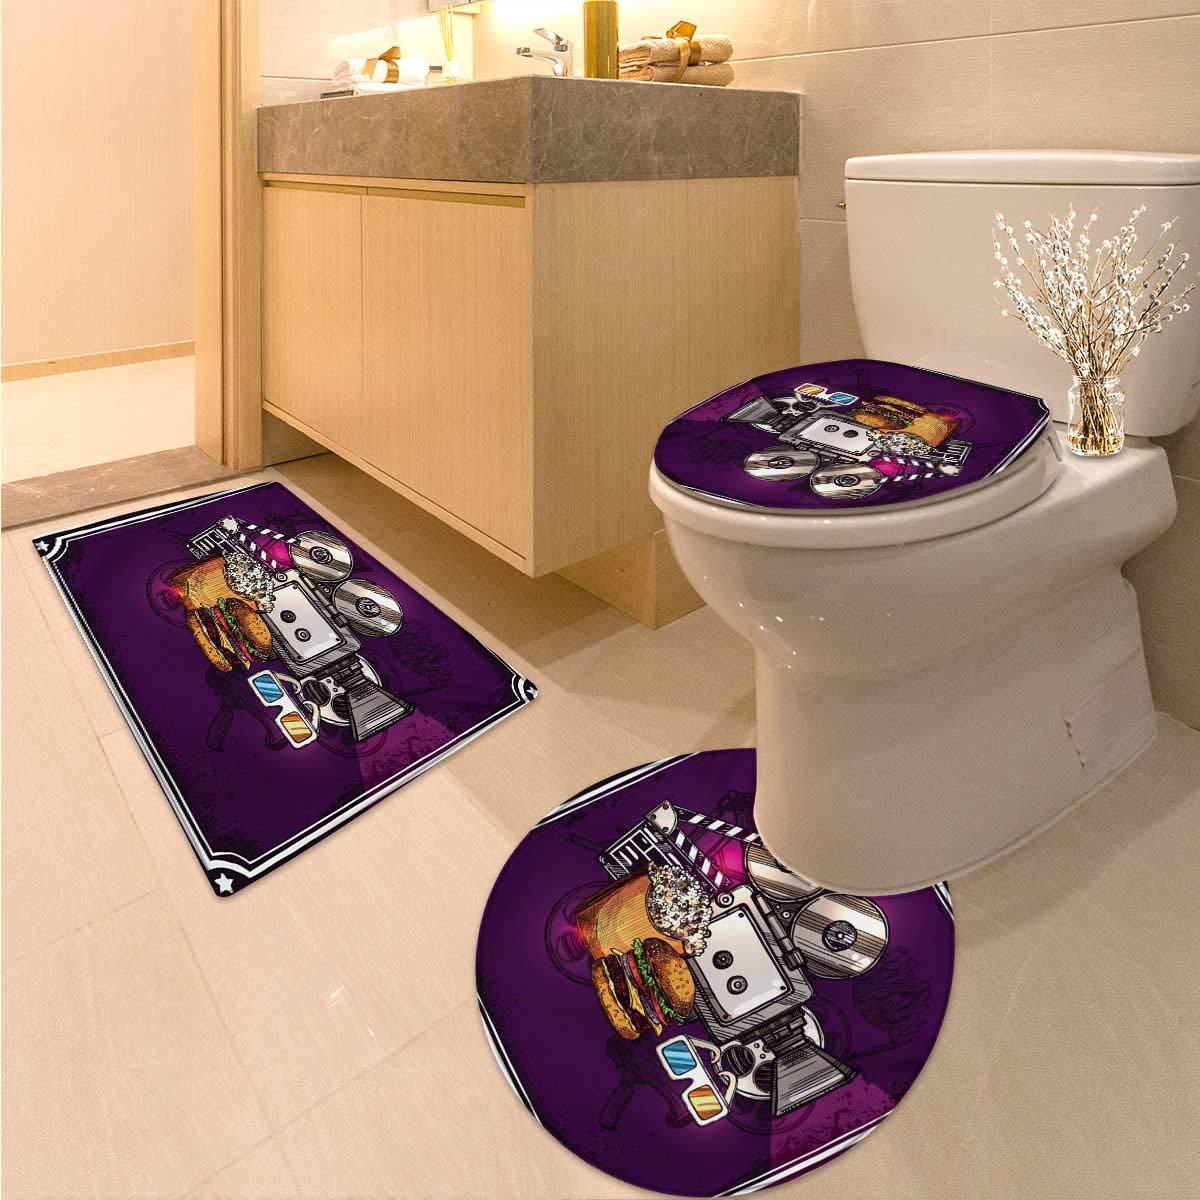 Anhuthree Modern Bath mat and Toilet mat Set Cartoon Like Cinema Movie Image Burgers Popcorns Glasses Watching Film 3 Piece Toilet lid Cover mat Set Purple Earth Yellow